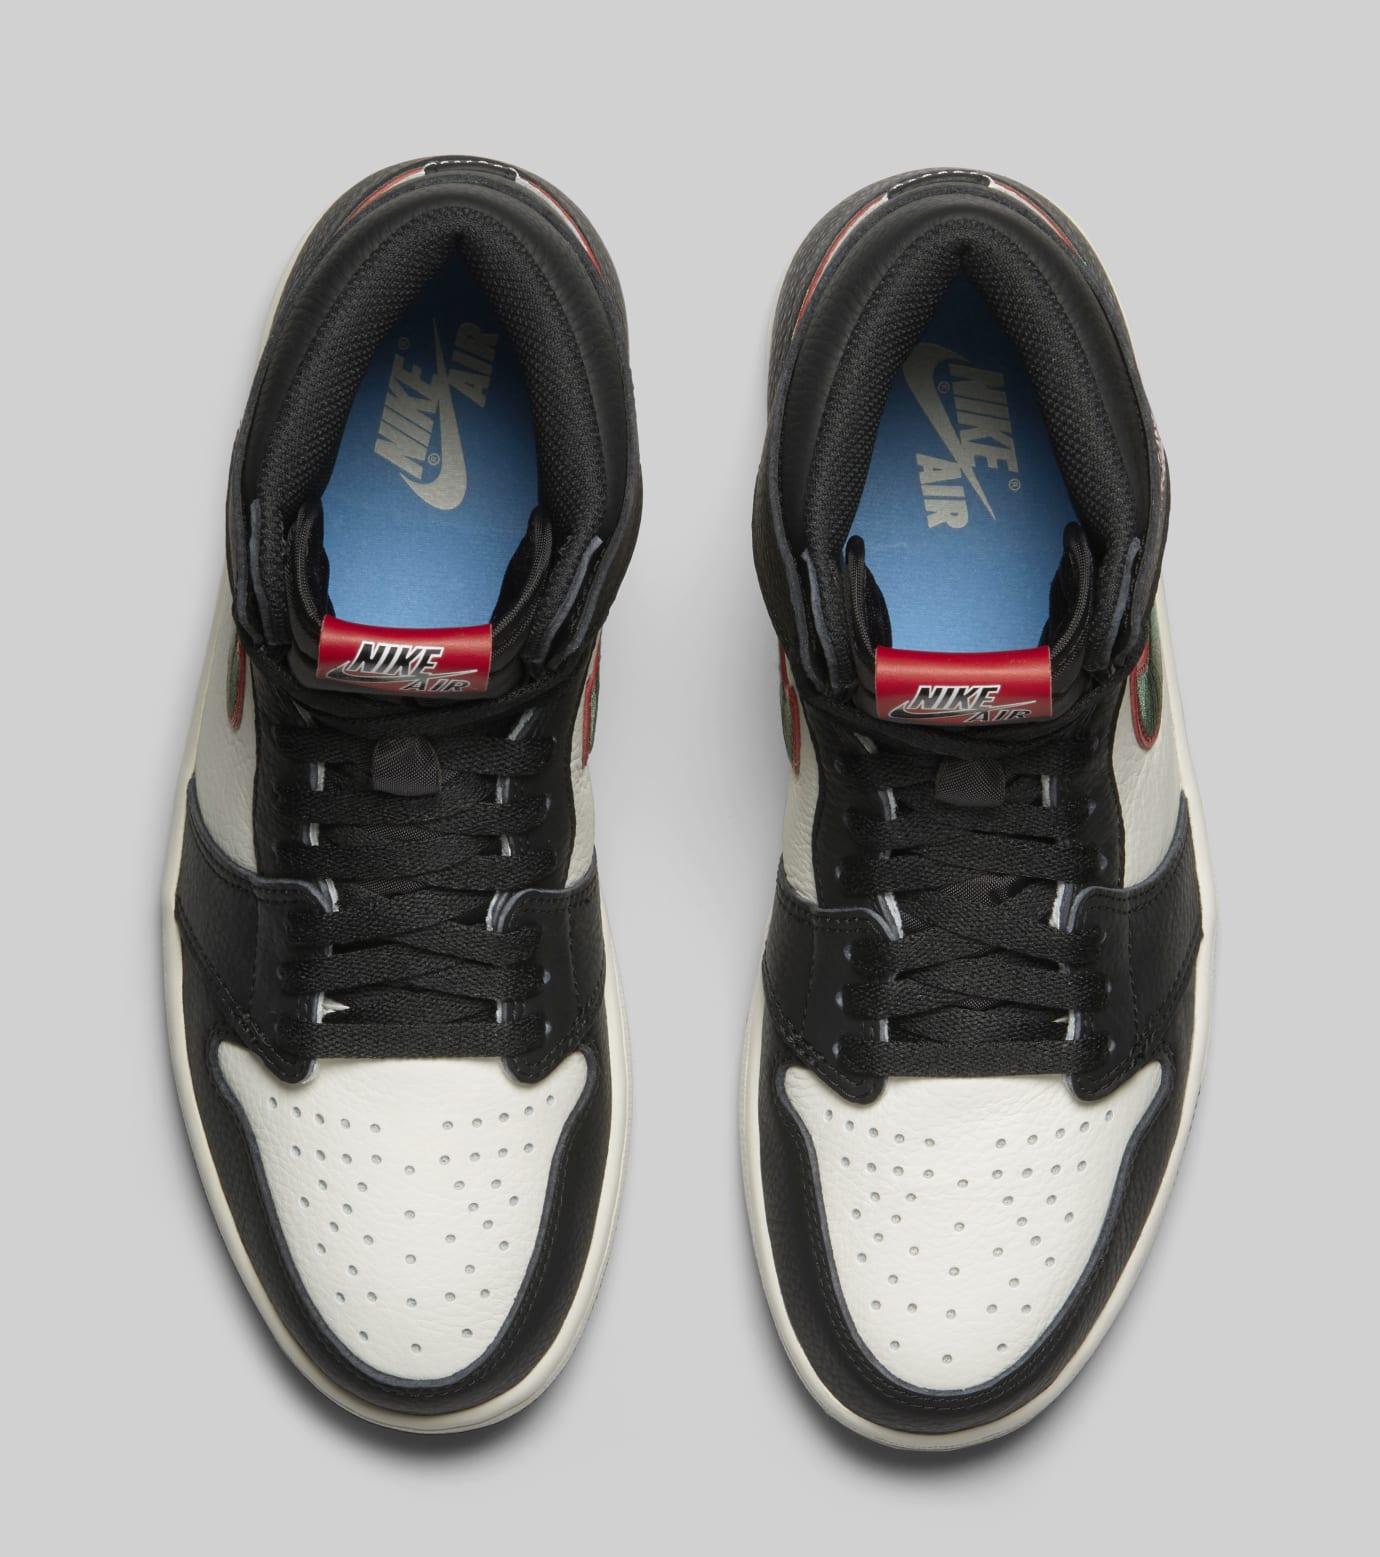 Air Jordan 1 High OG 'A Star Is Born' 555088-015 (Top)